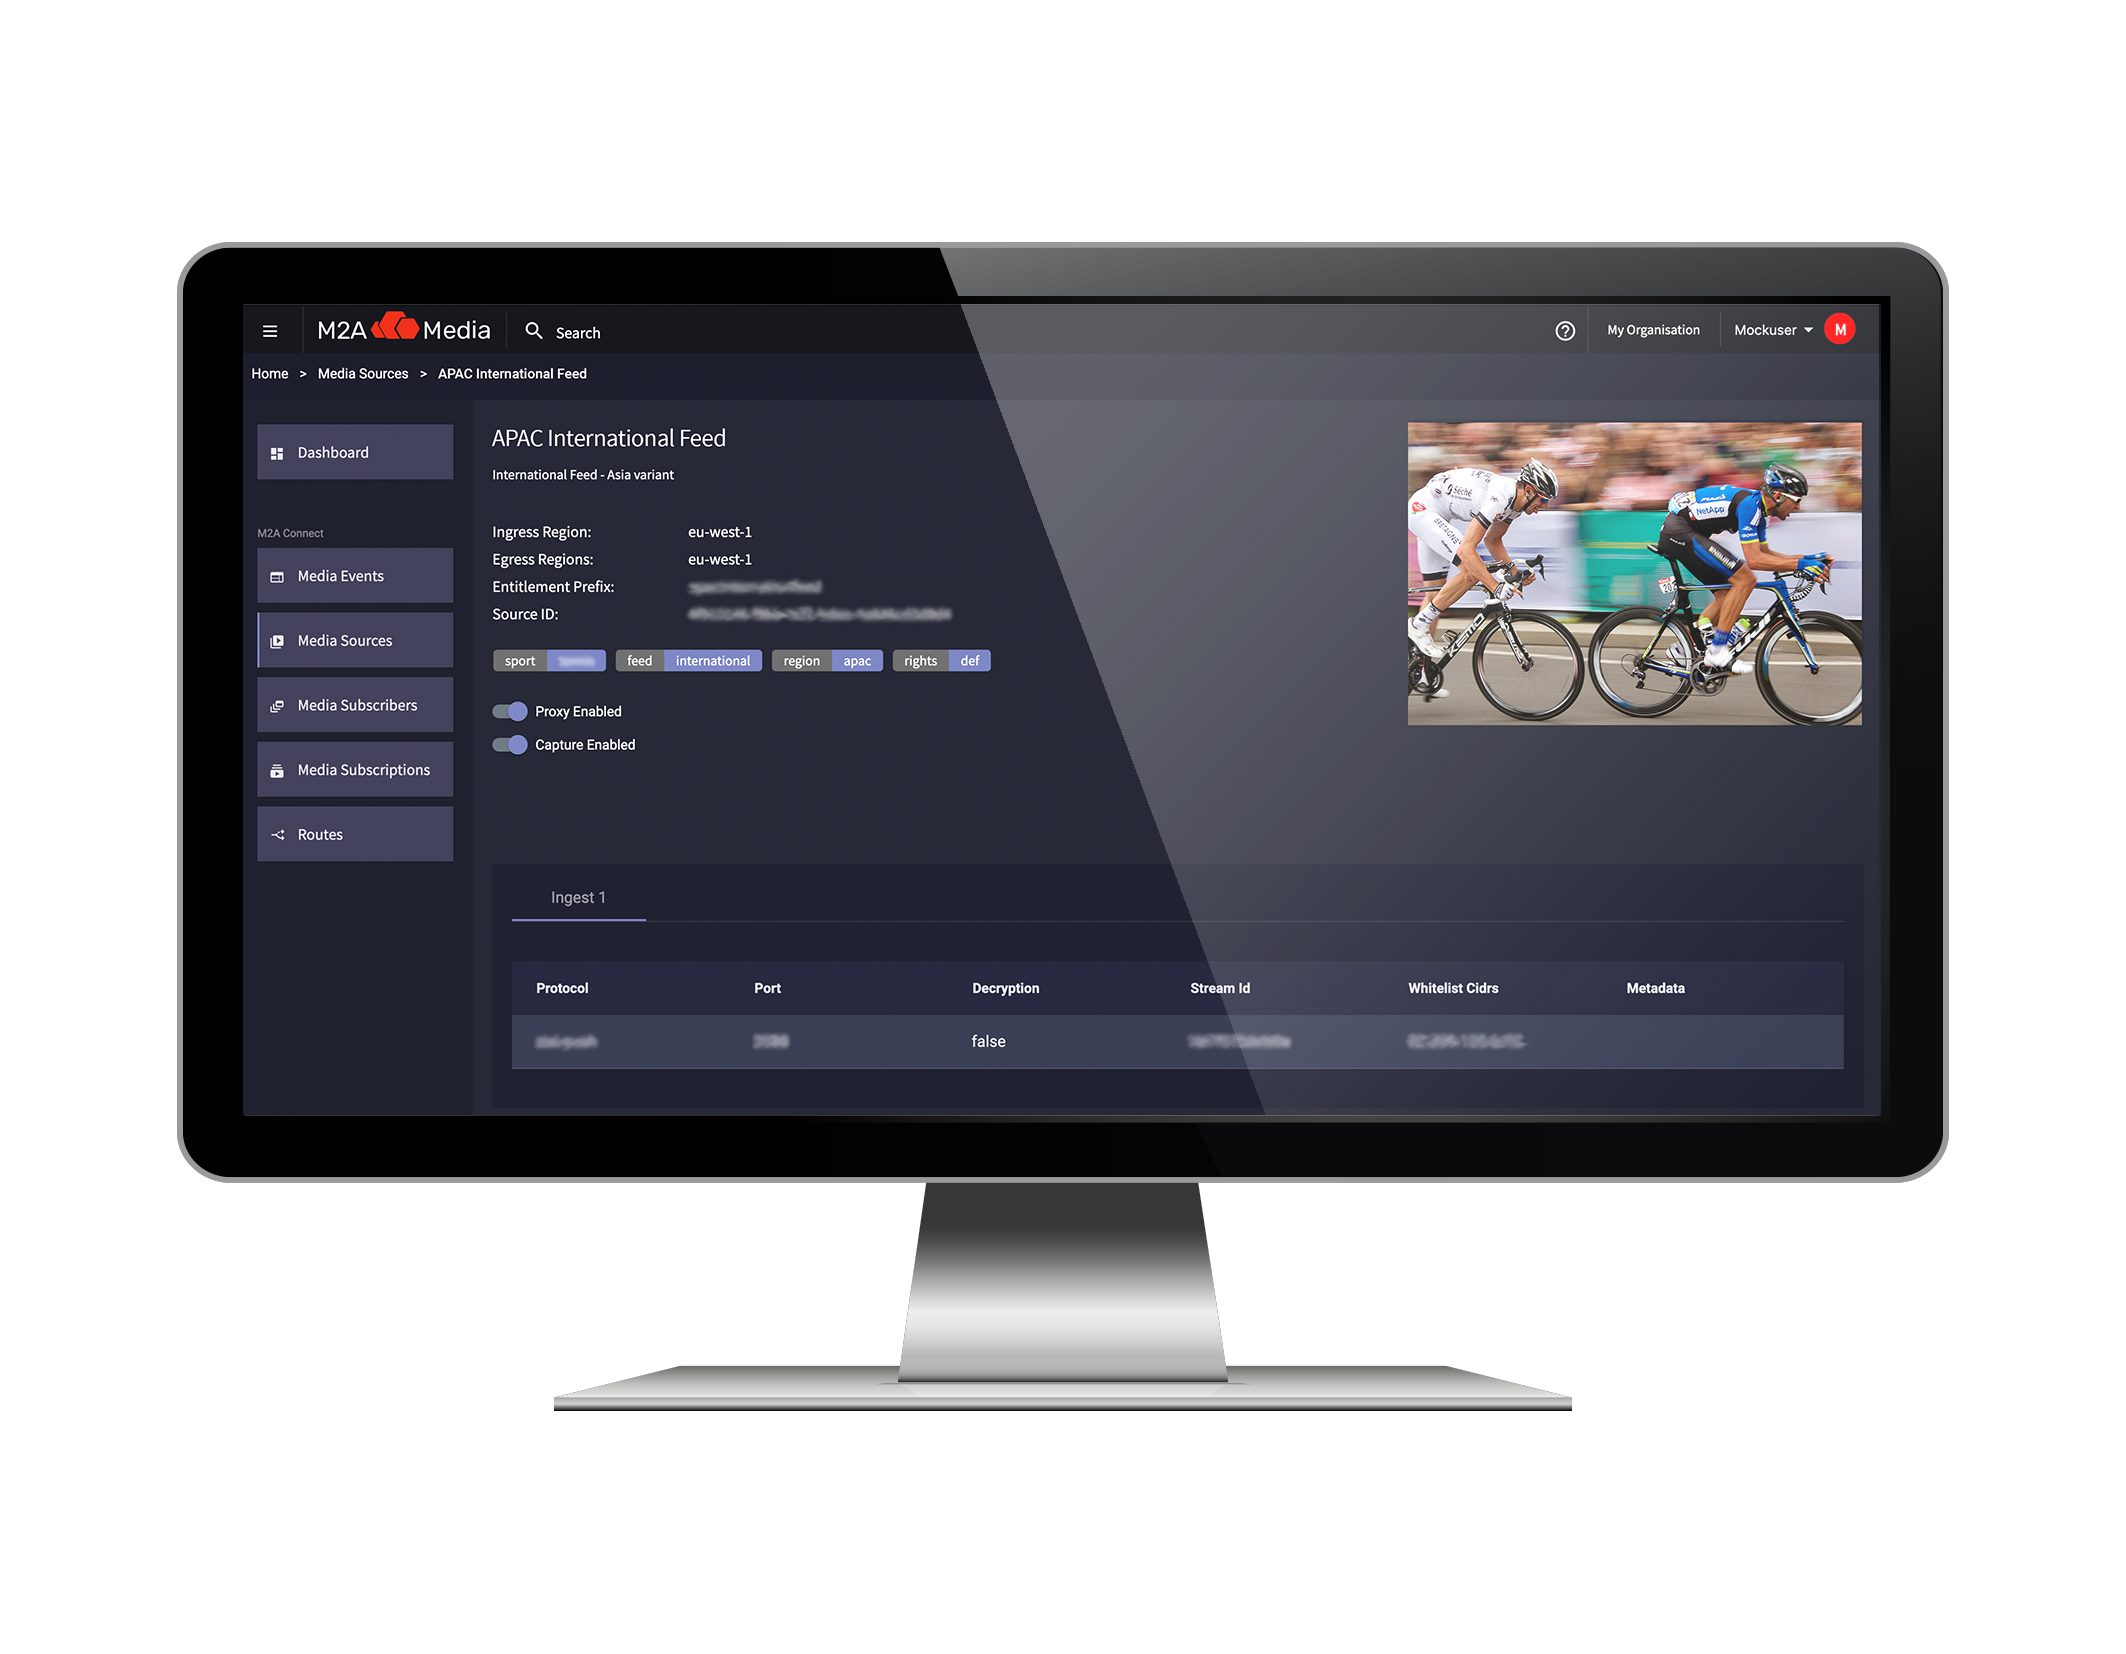 console-image-monitor